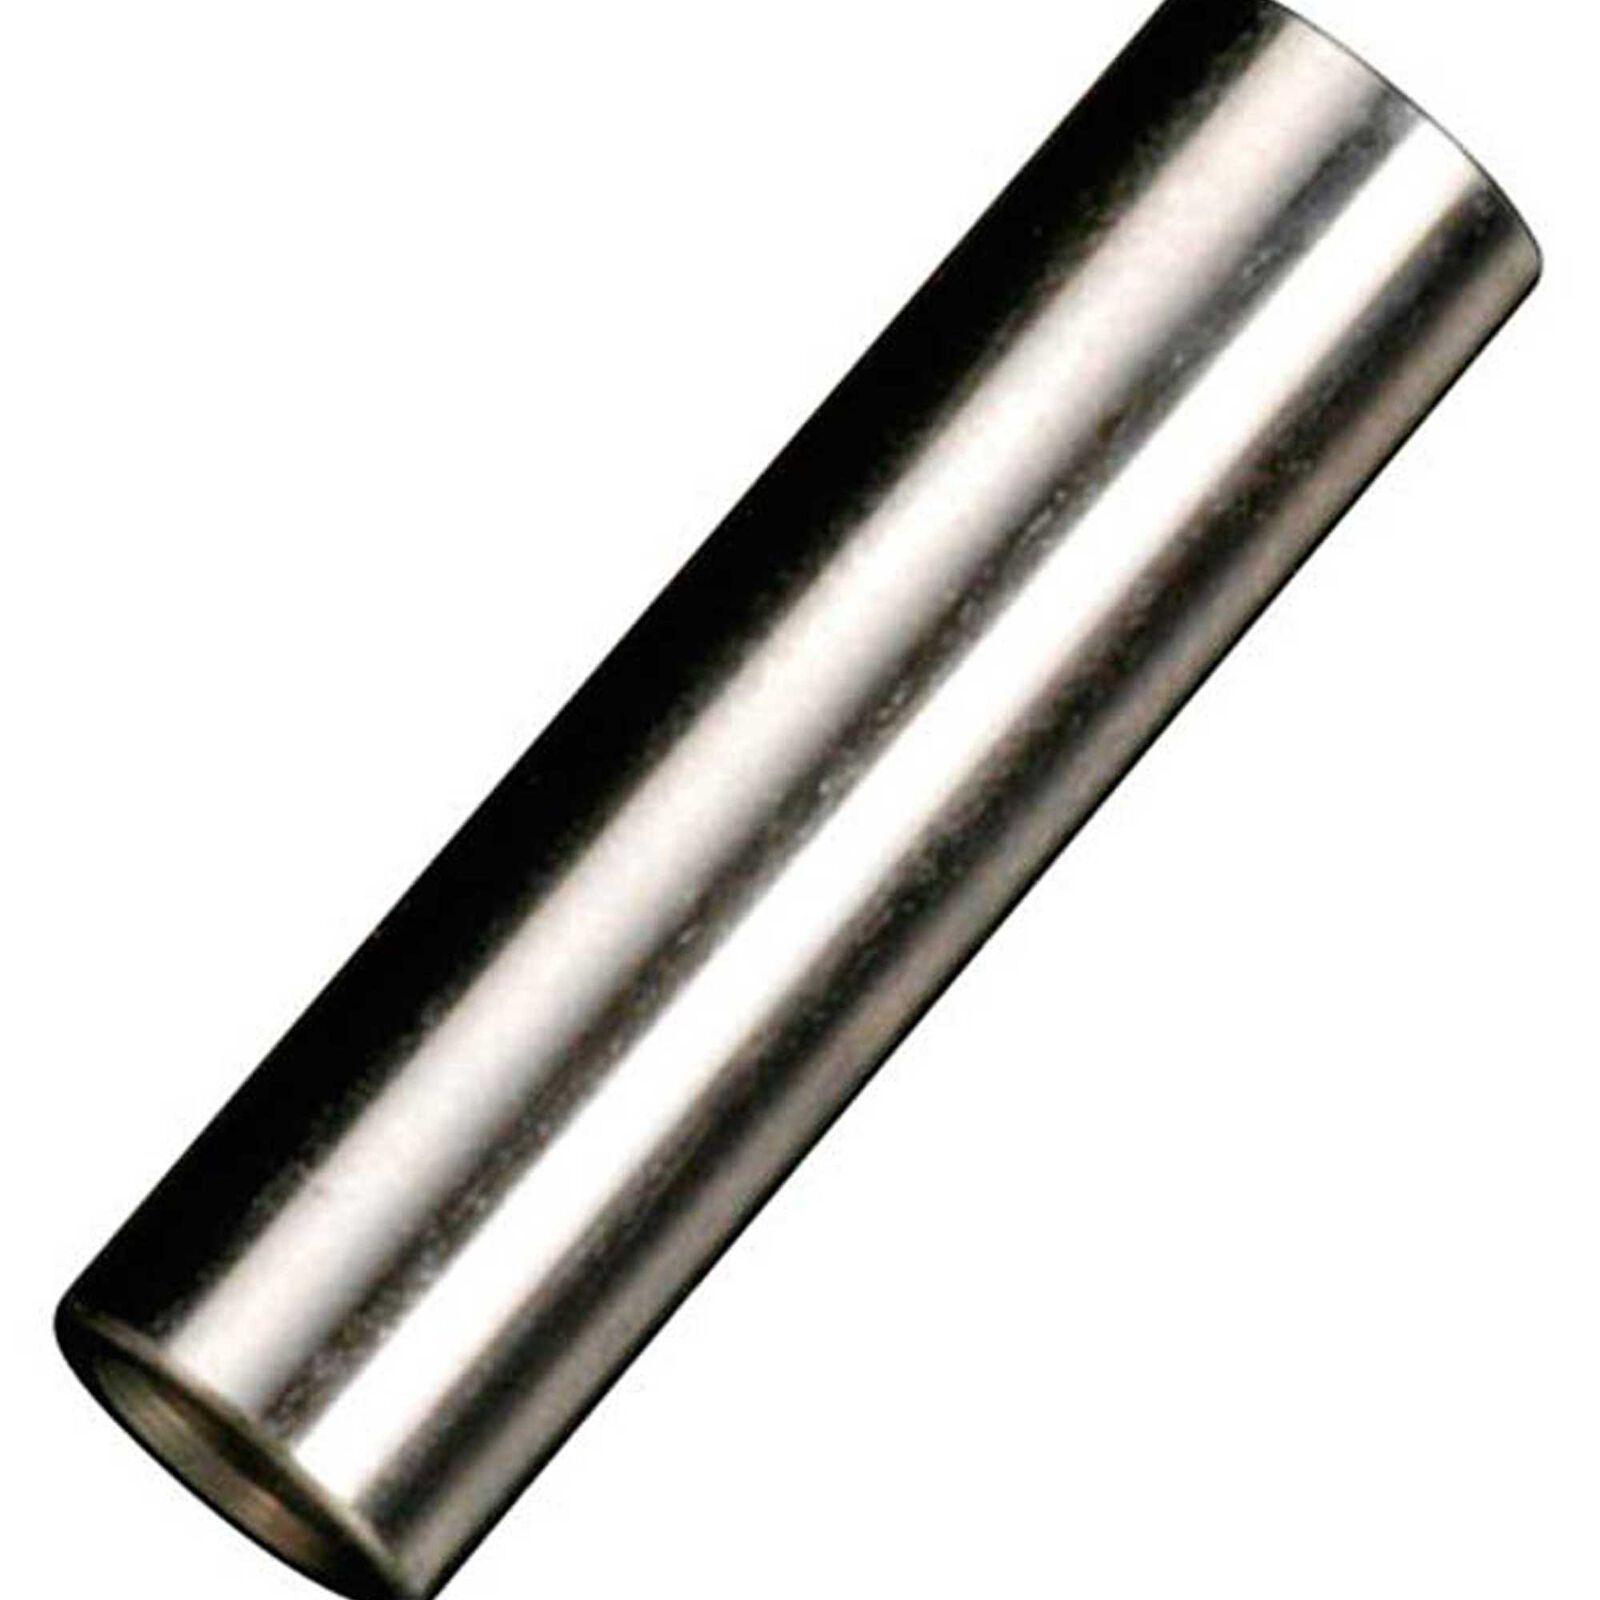 Piston Pin: 40-46